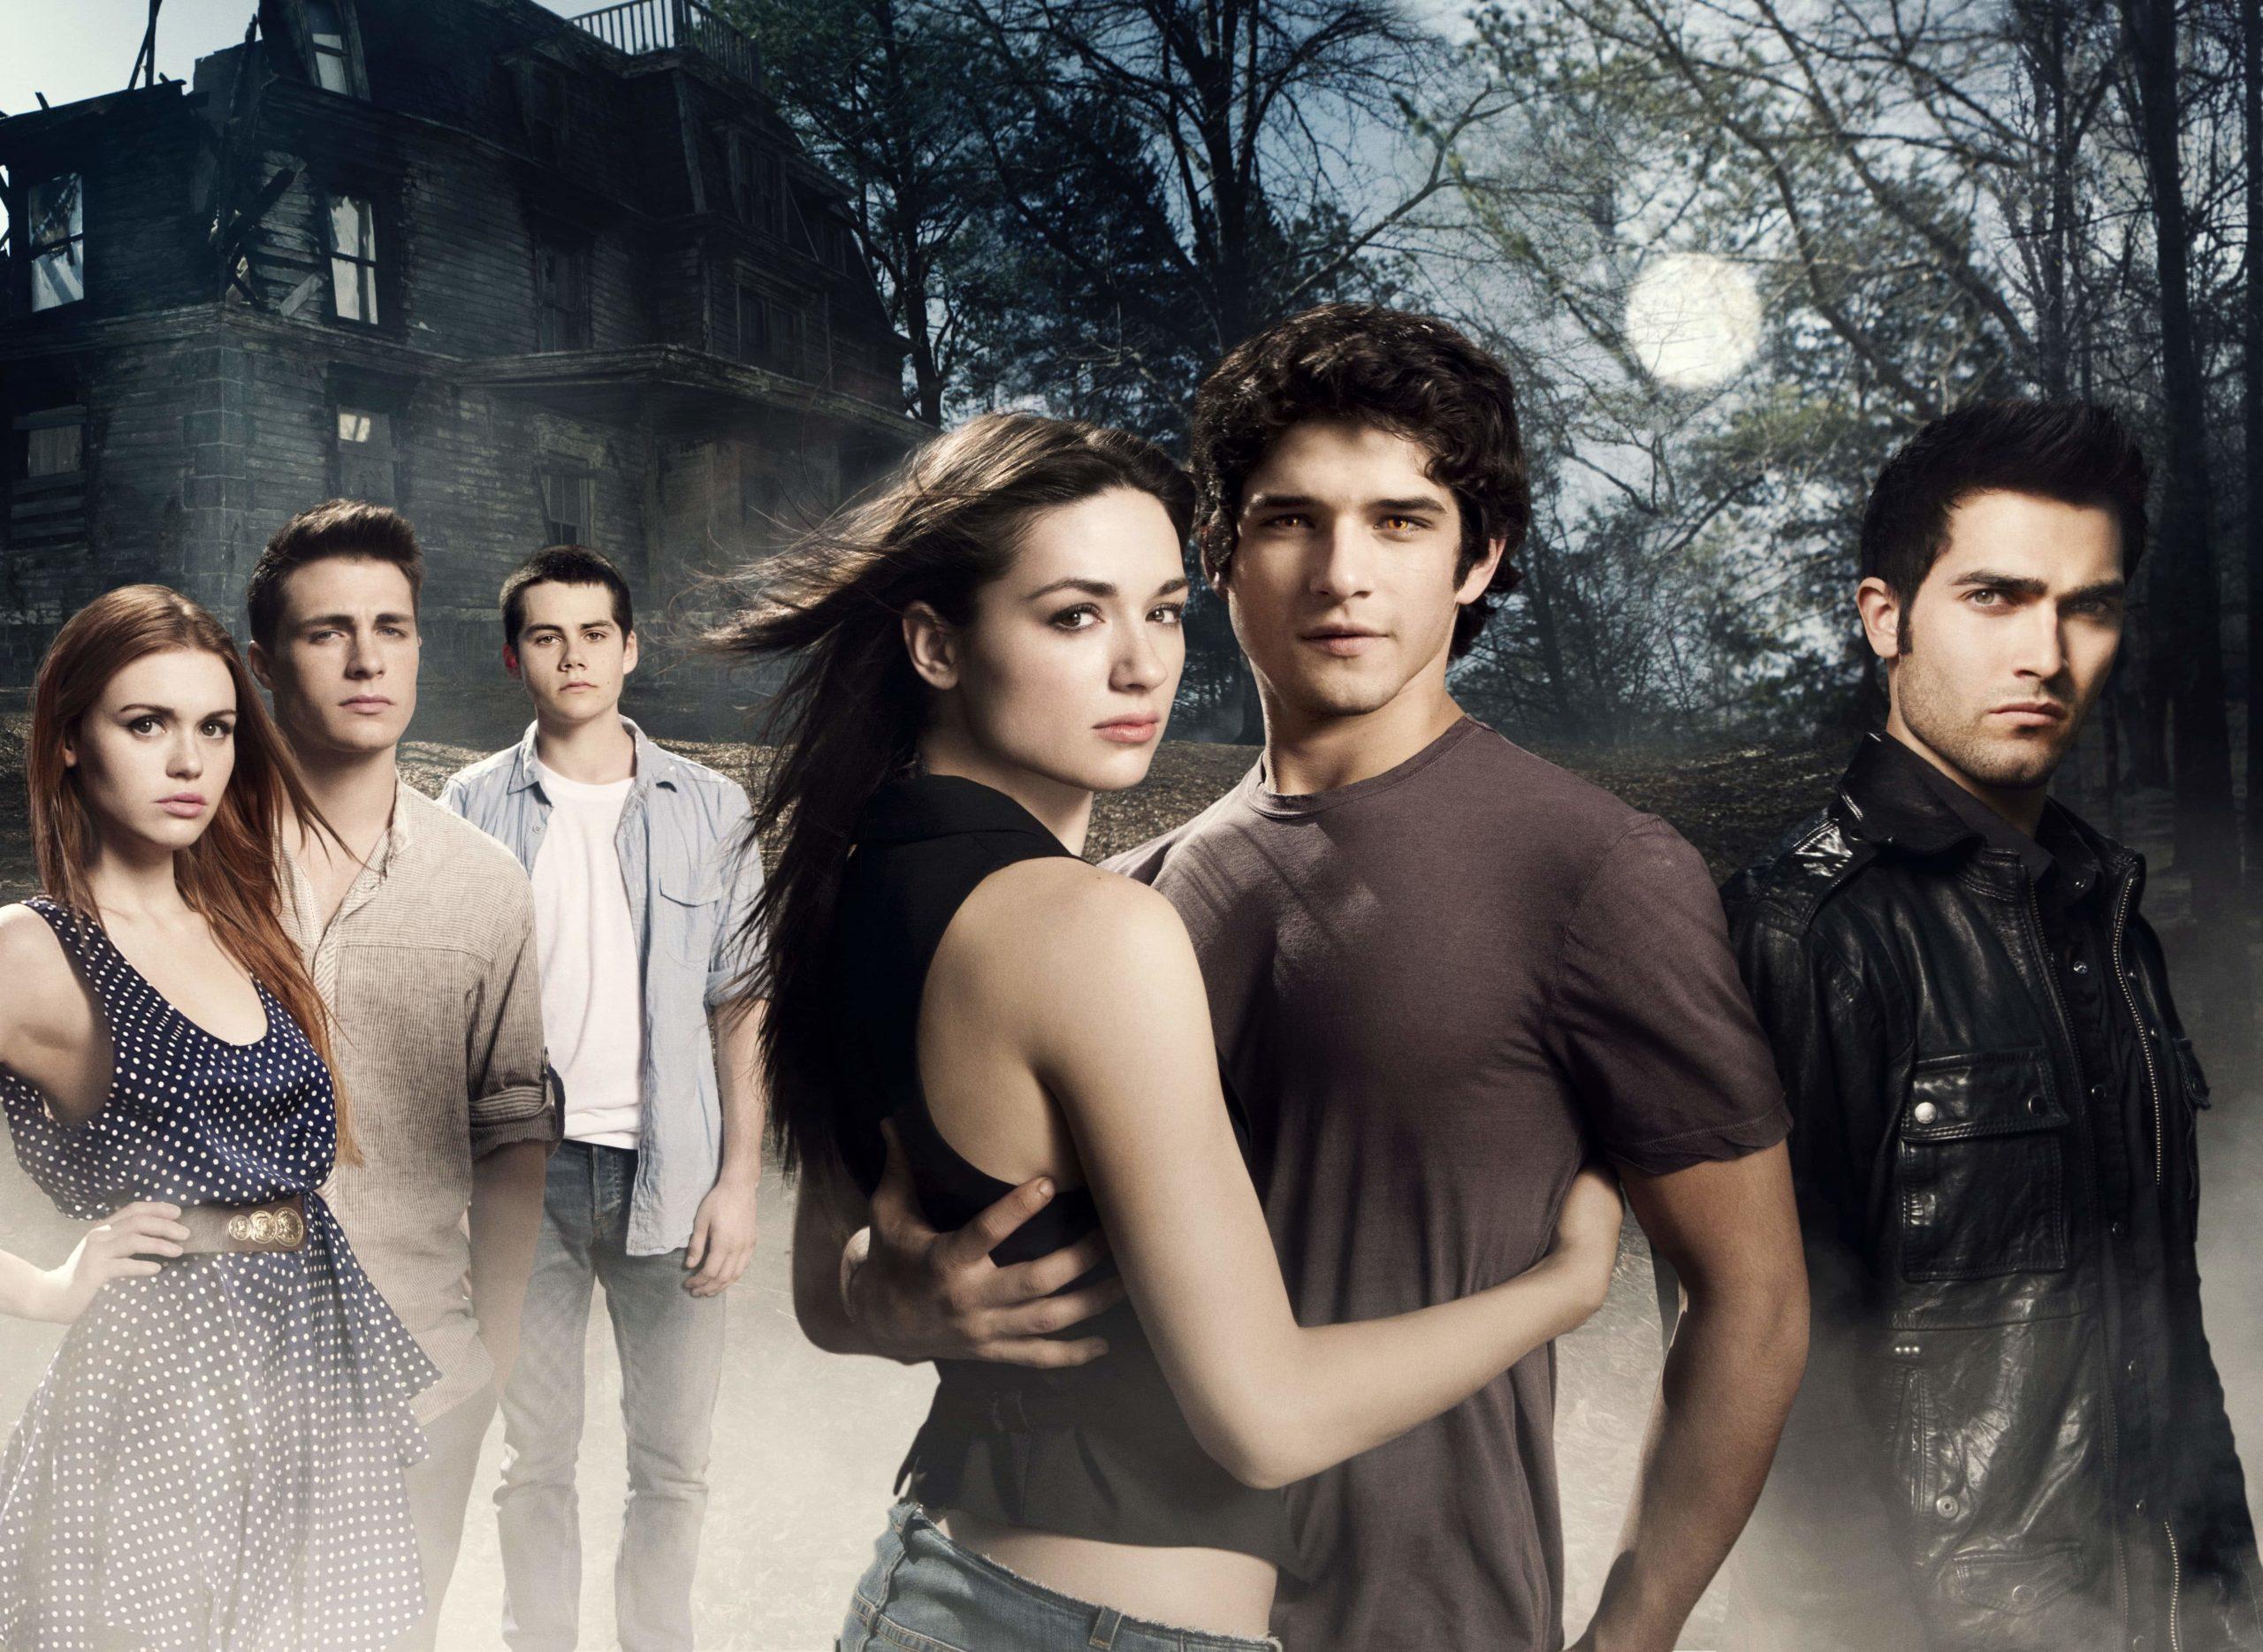 teen_wolf_full_cast